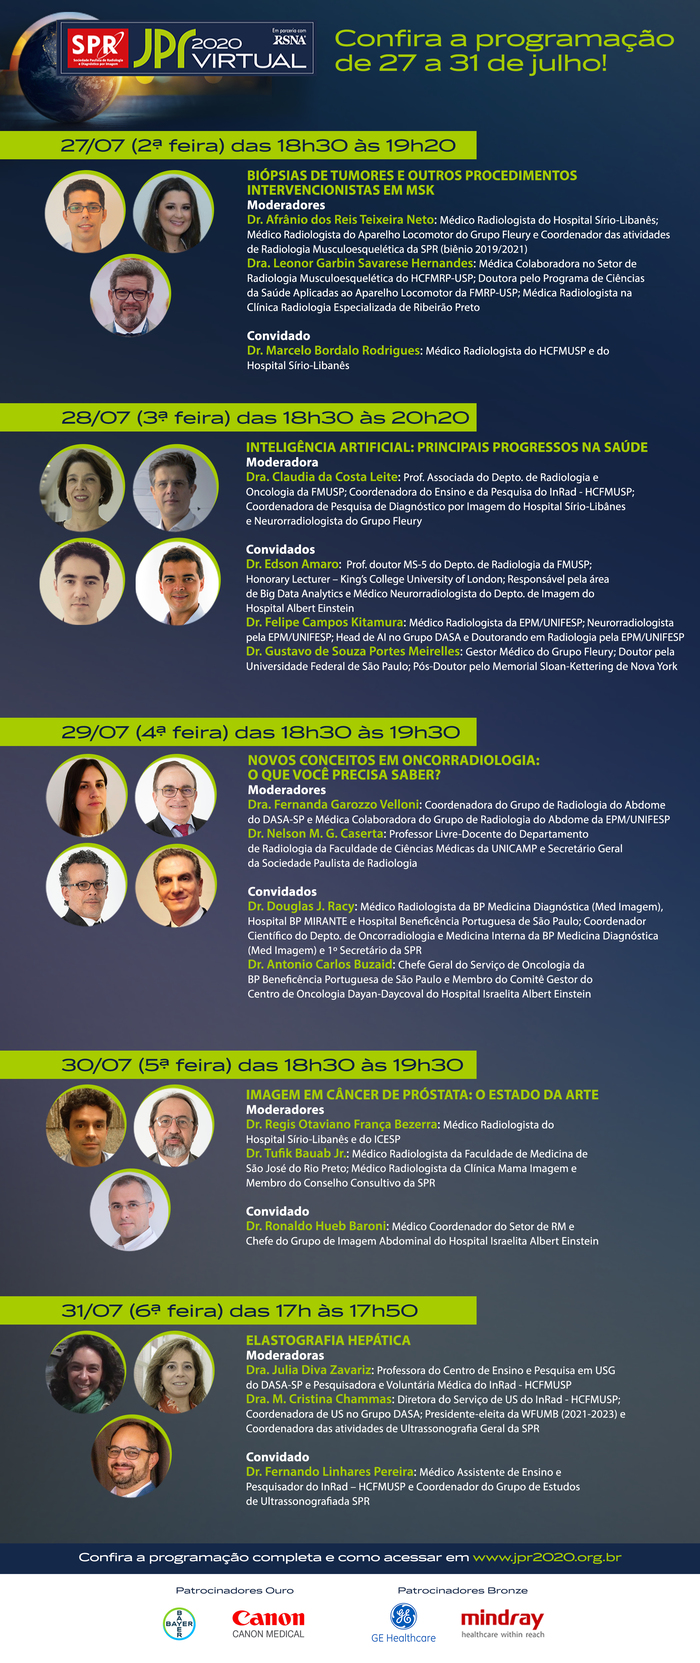 Participe das lives da JPR 2020 Virtual desta semana